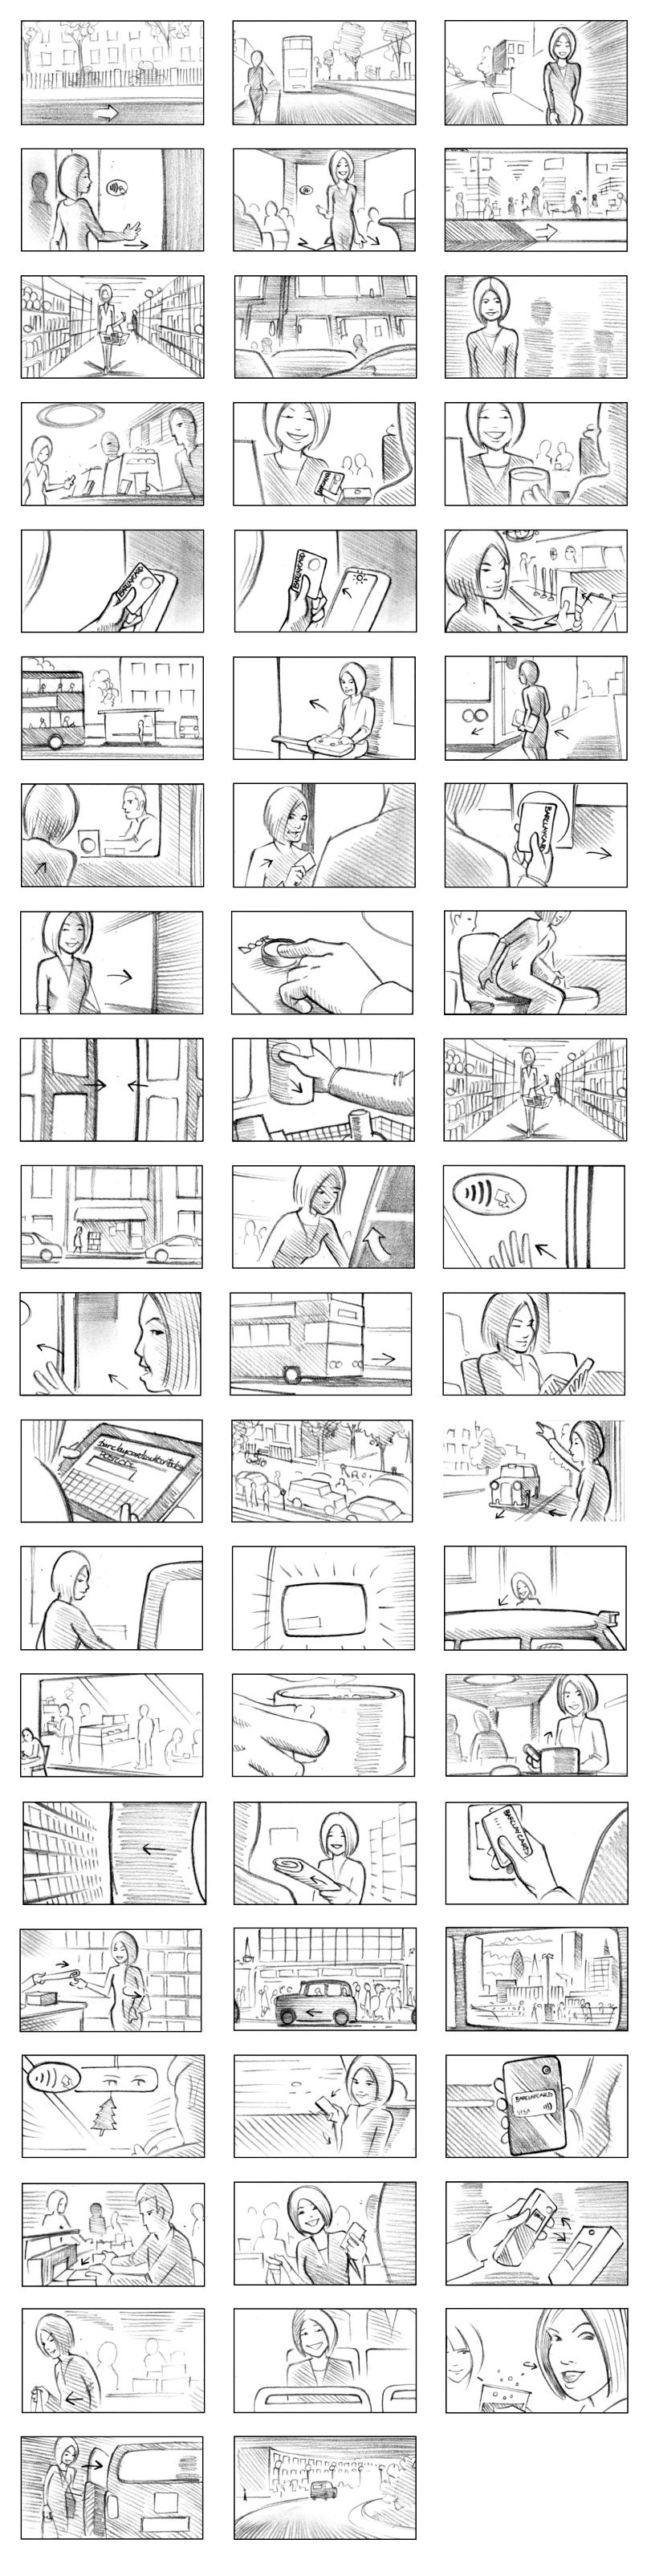 BARCLAYCARD STORYBOARD BY ANDY SPARROW